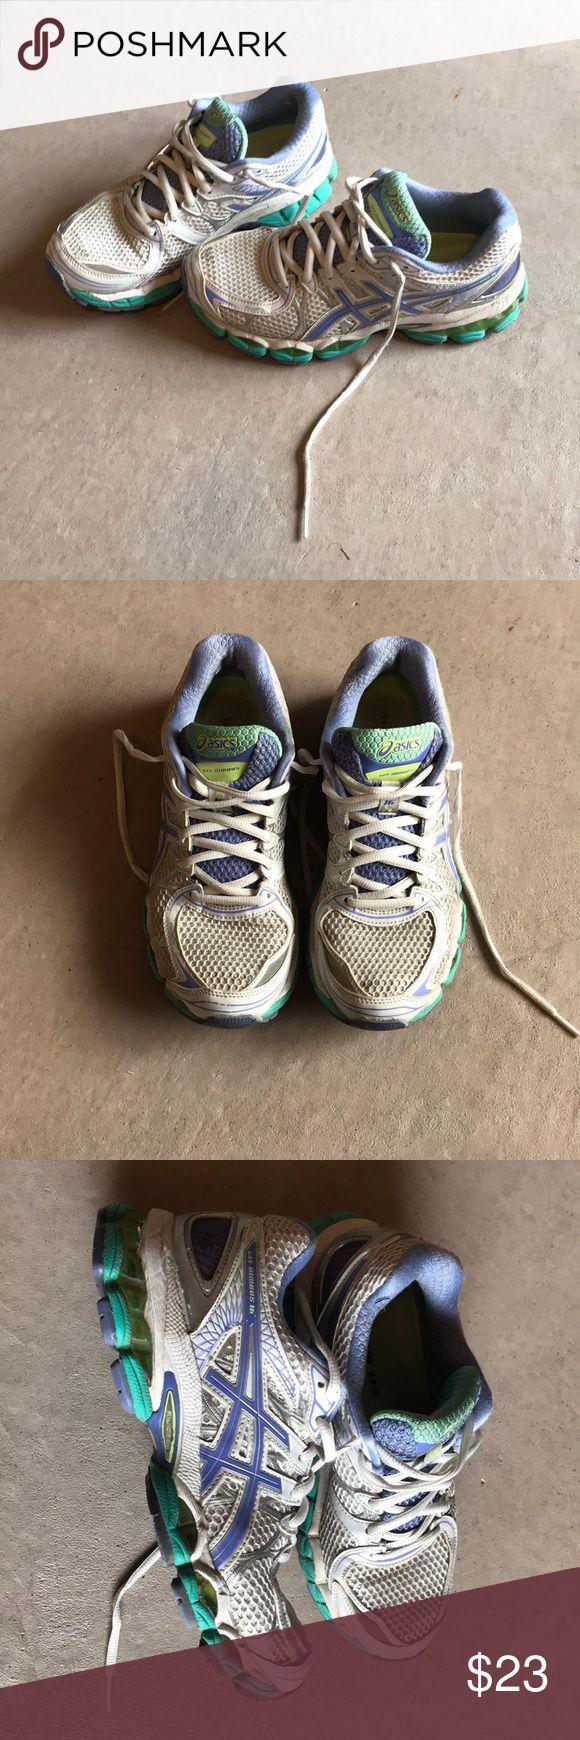 ASICS running shoes! Women's 6.5 ASICS Gel-nimbus 16 Asics Shoes Sneakers